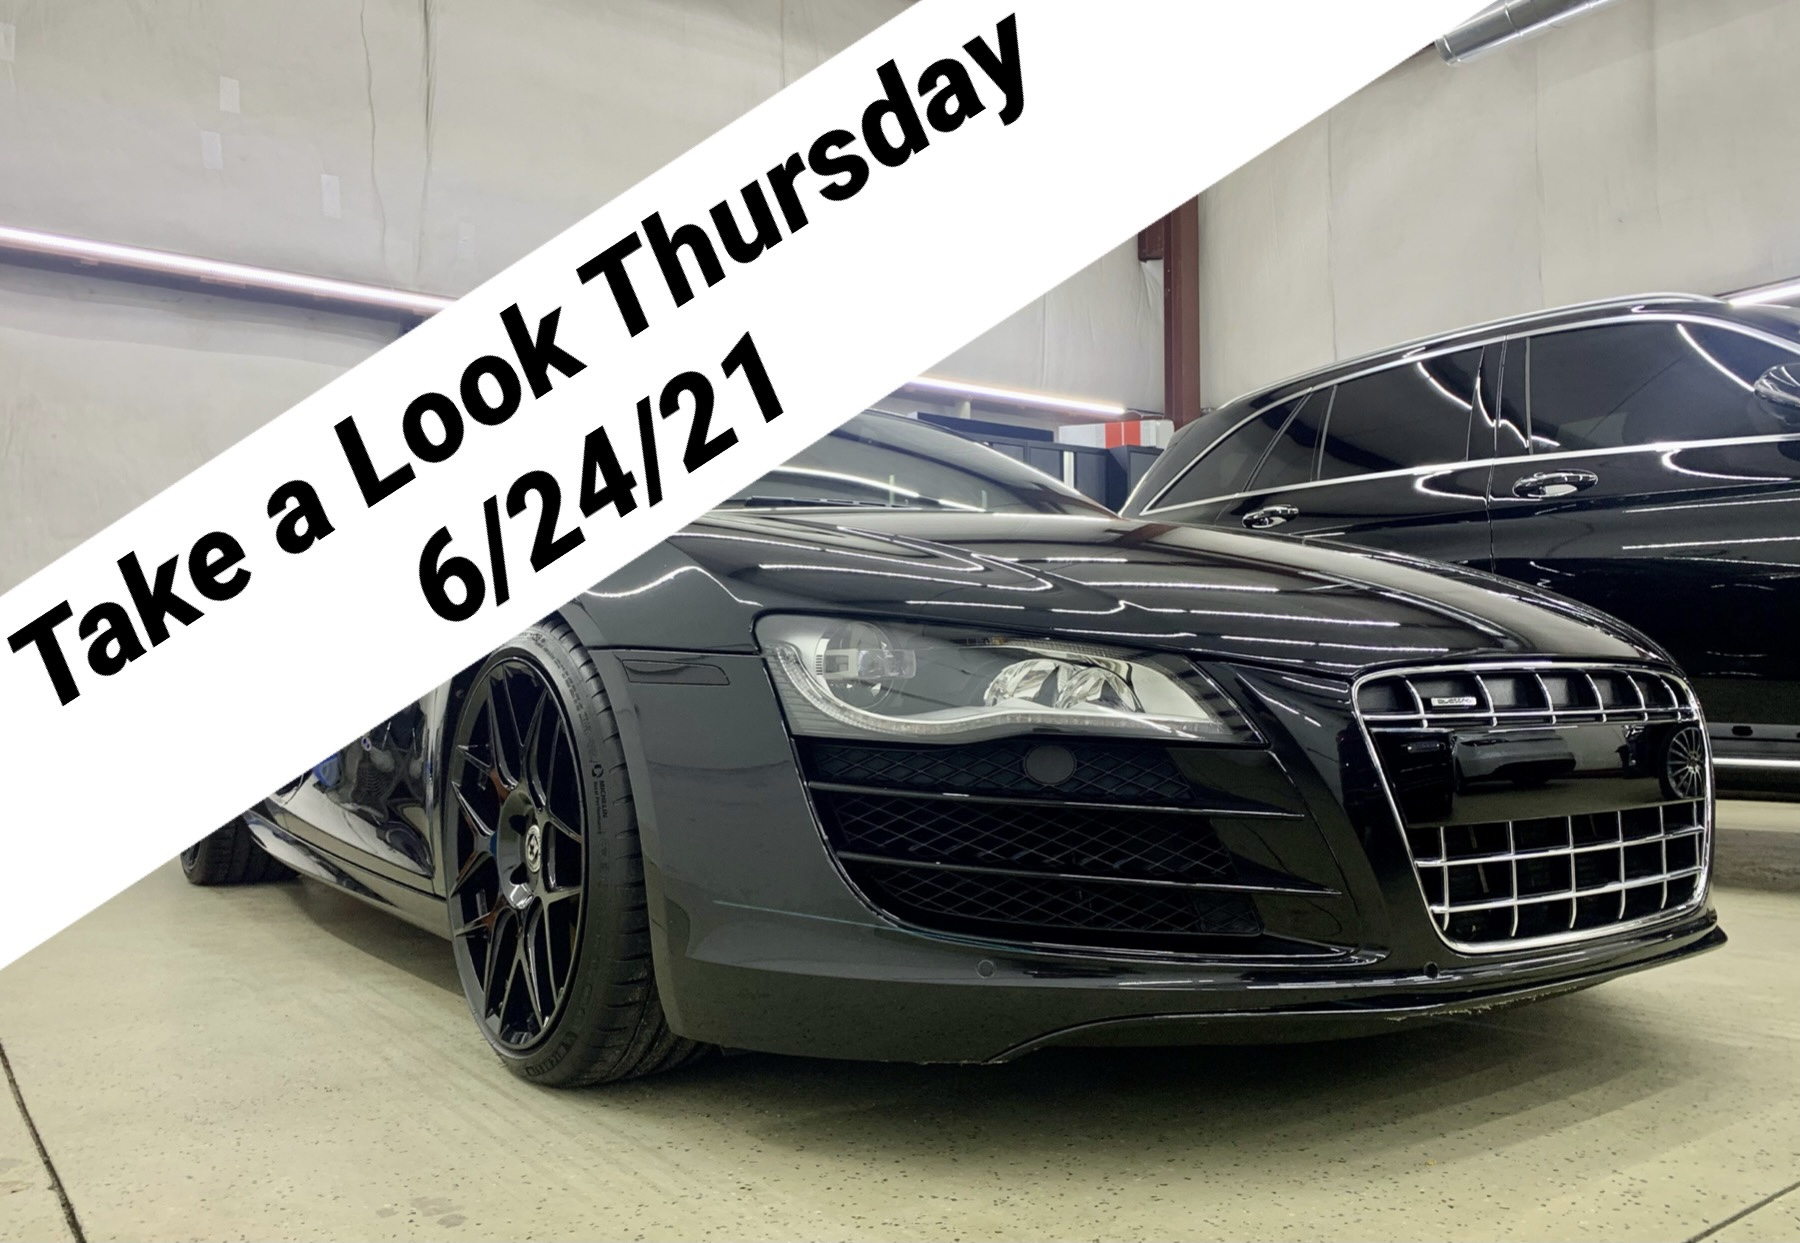 Take a Look Thursday 6/24/21